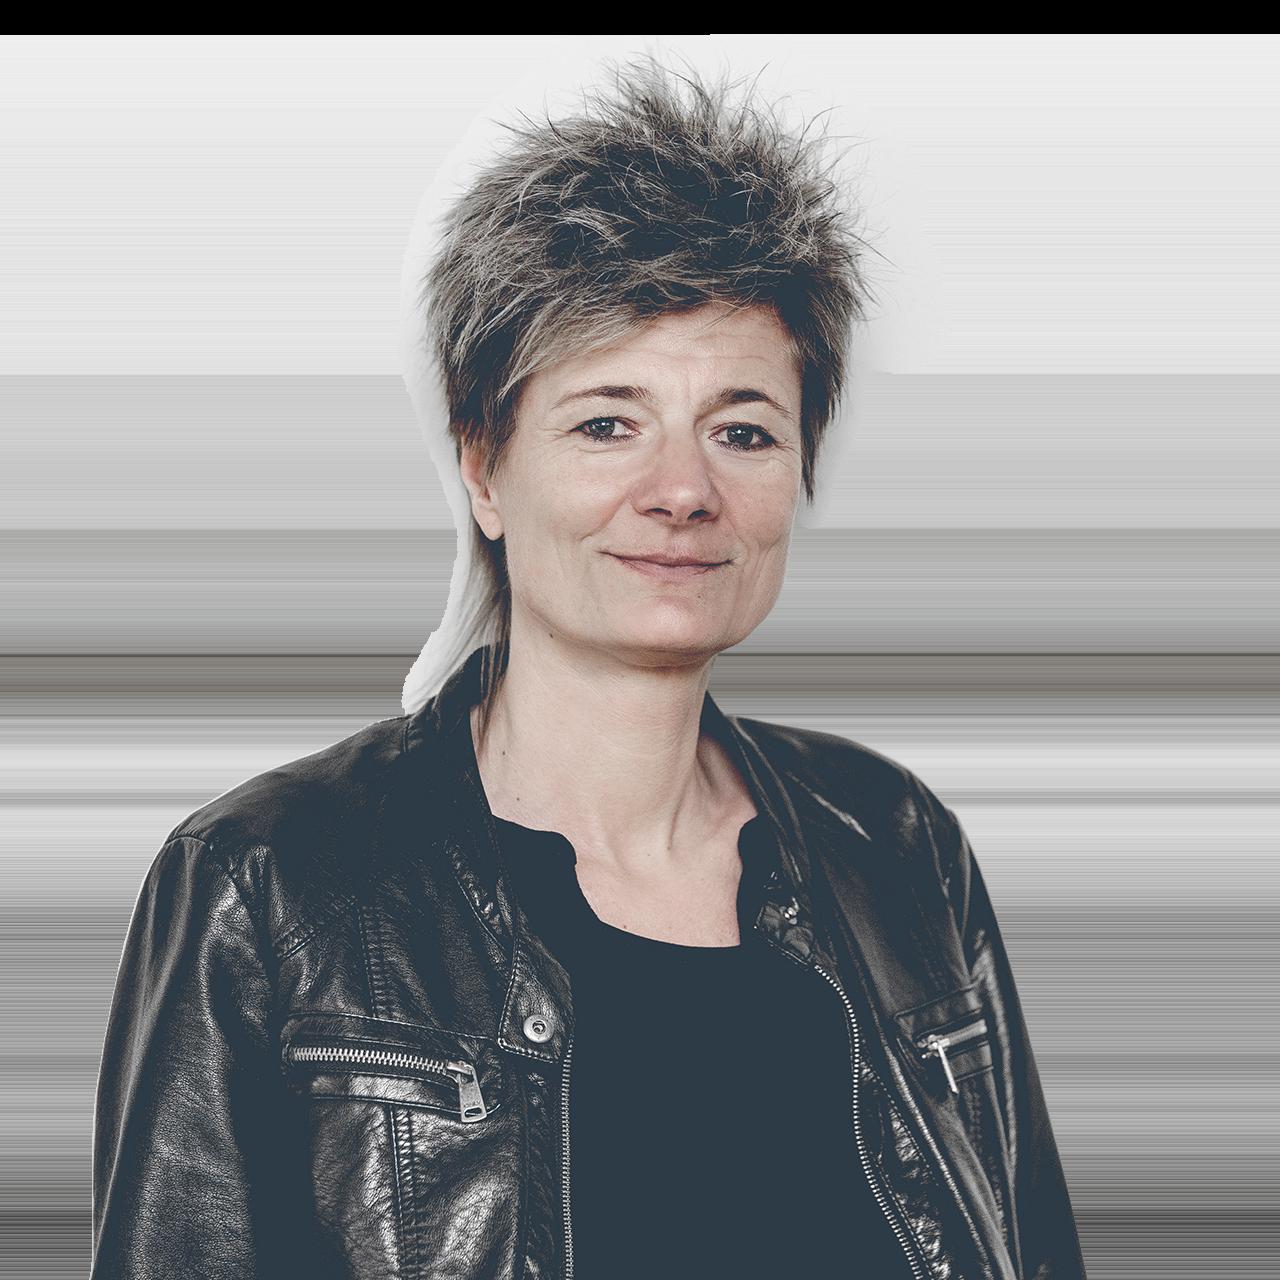 Ulrike Jeromin